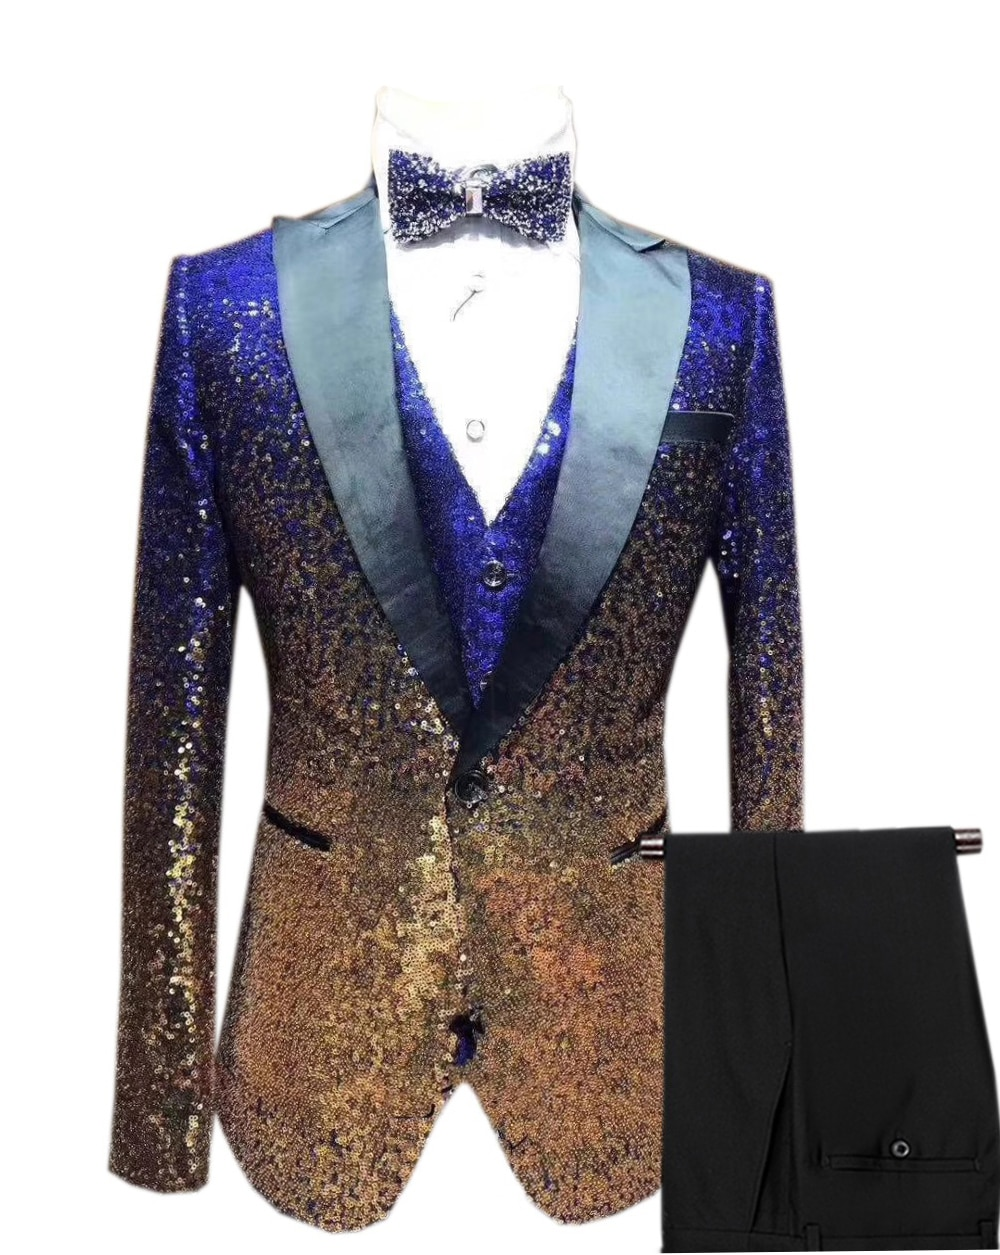 Chaqueta de esmoquin para hombre con 3 piezas de lentejuelas de Color para hombre, chaqueta de esmoquin con solapa de muesca para boda, Borgoña, dorado, plateado, Real (Blazer + chaleco + Pantalones)